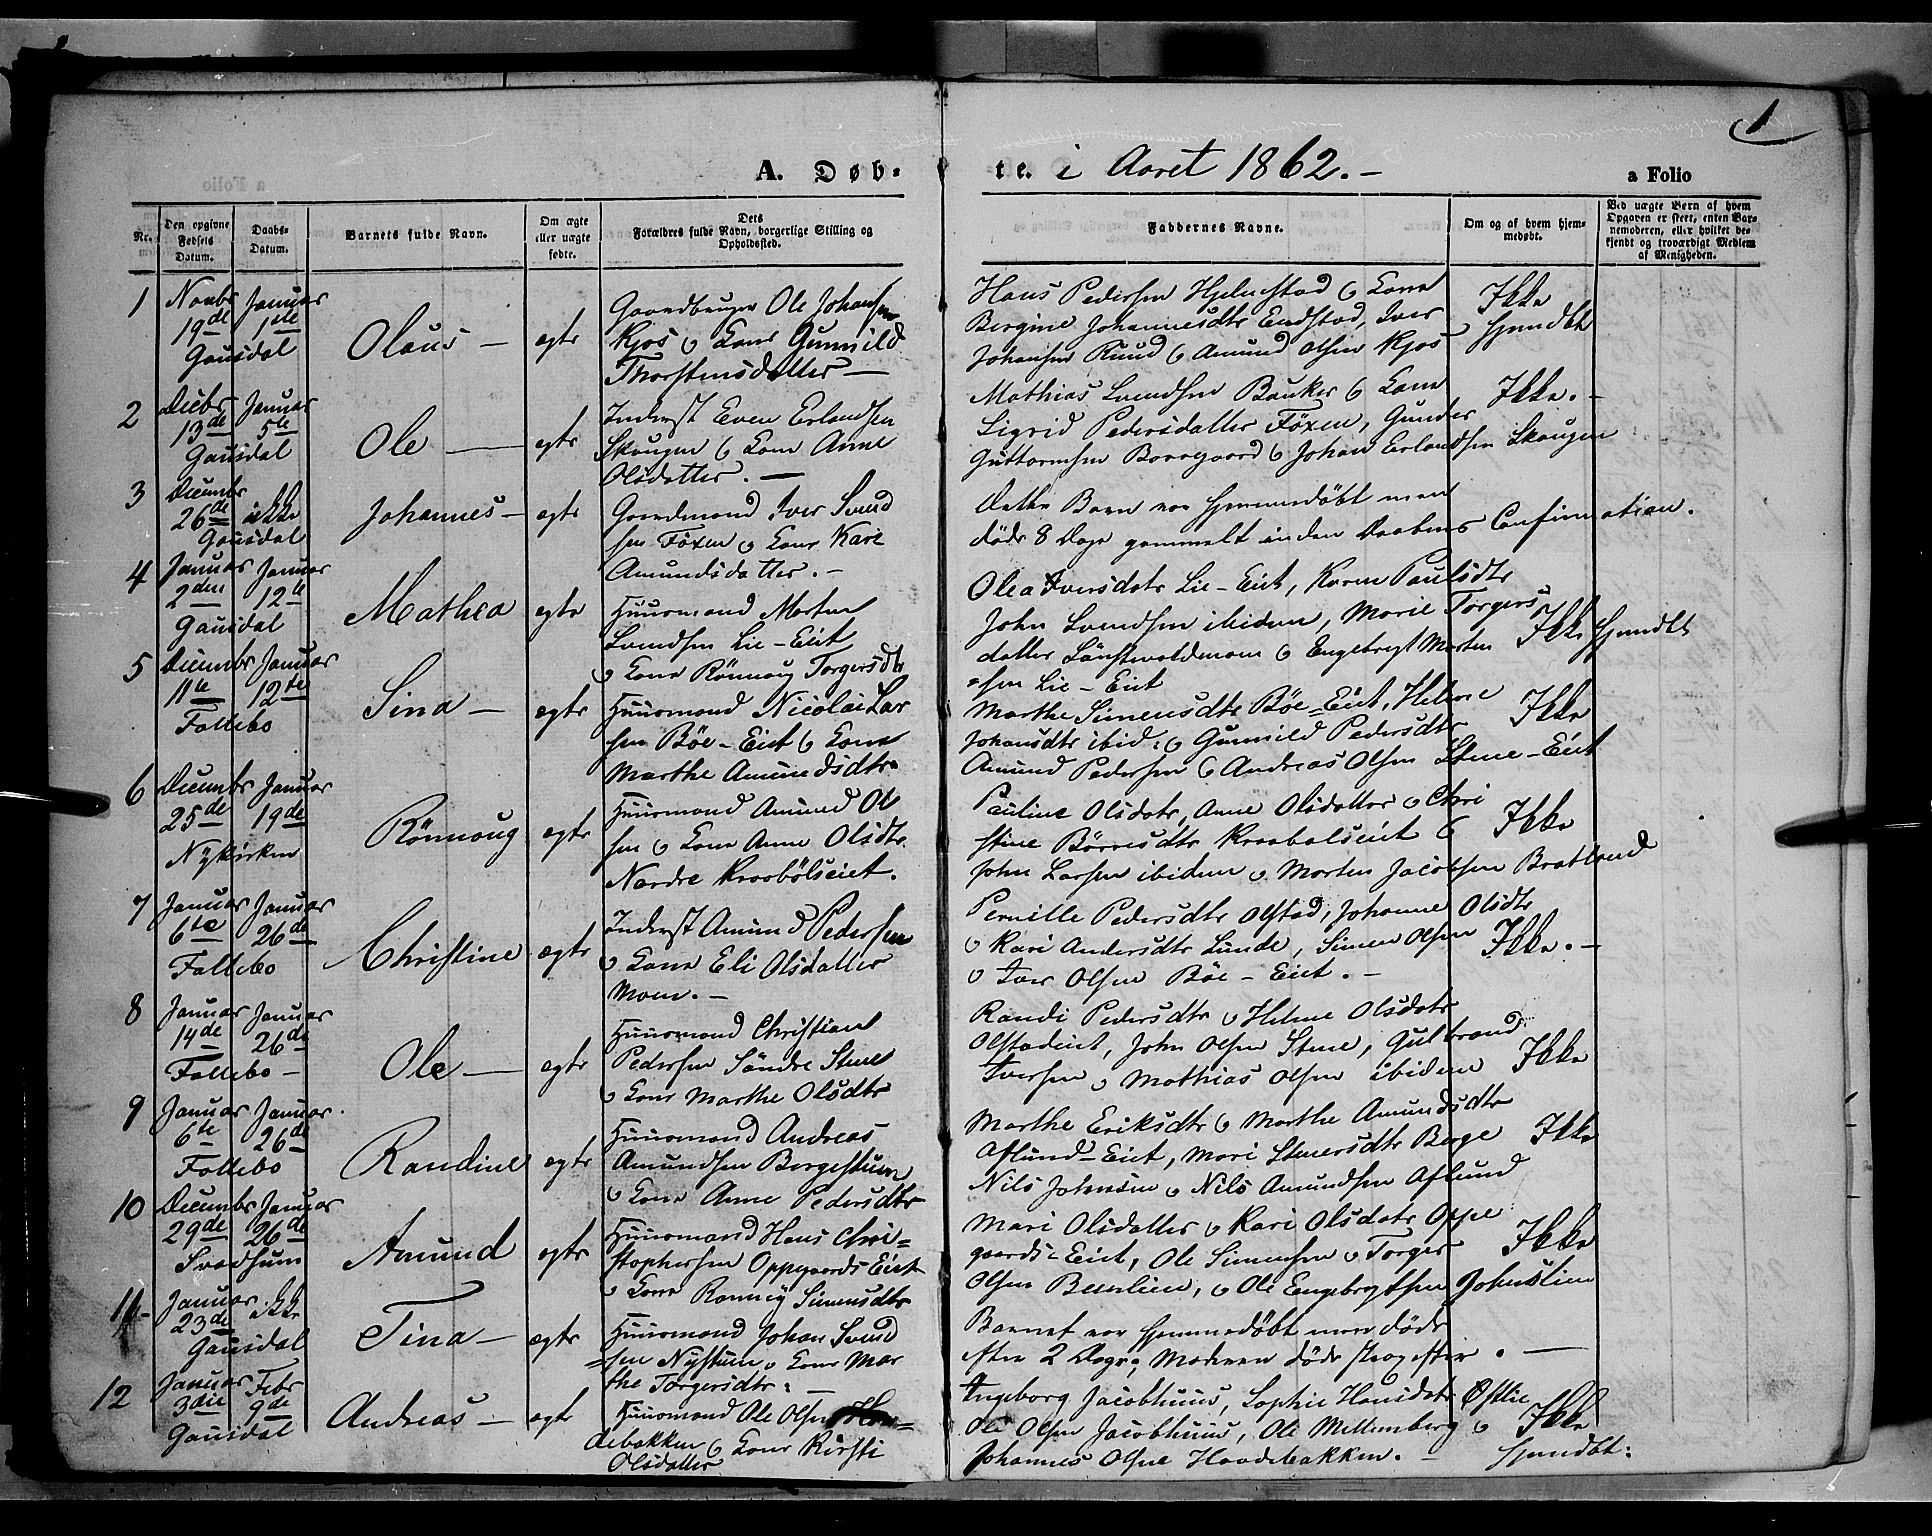 SAH, Gausdal prestekontor, Ministerialbok nr. 9, 1862-1873, s. 1